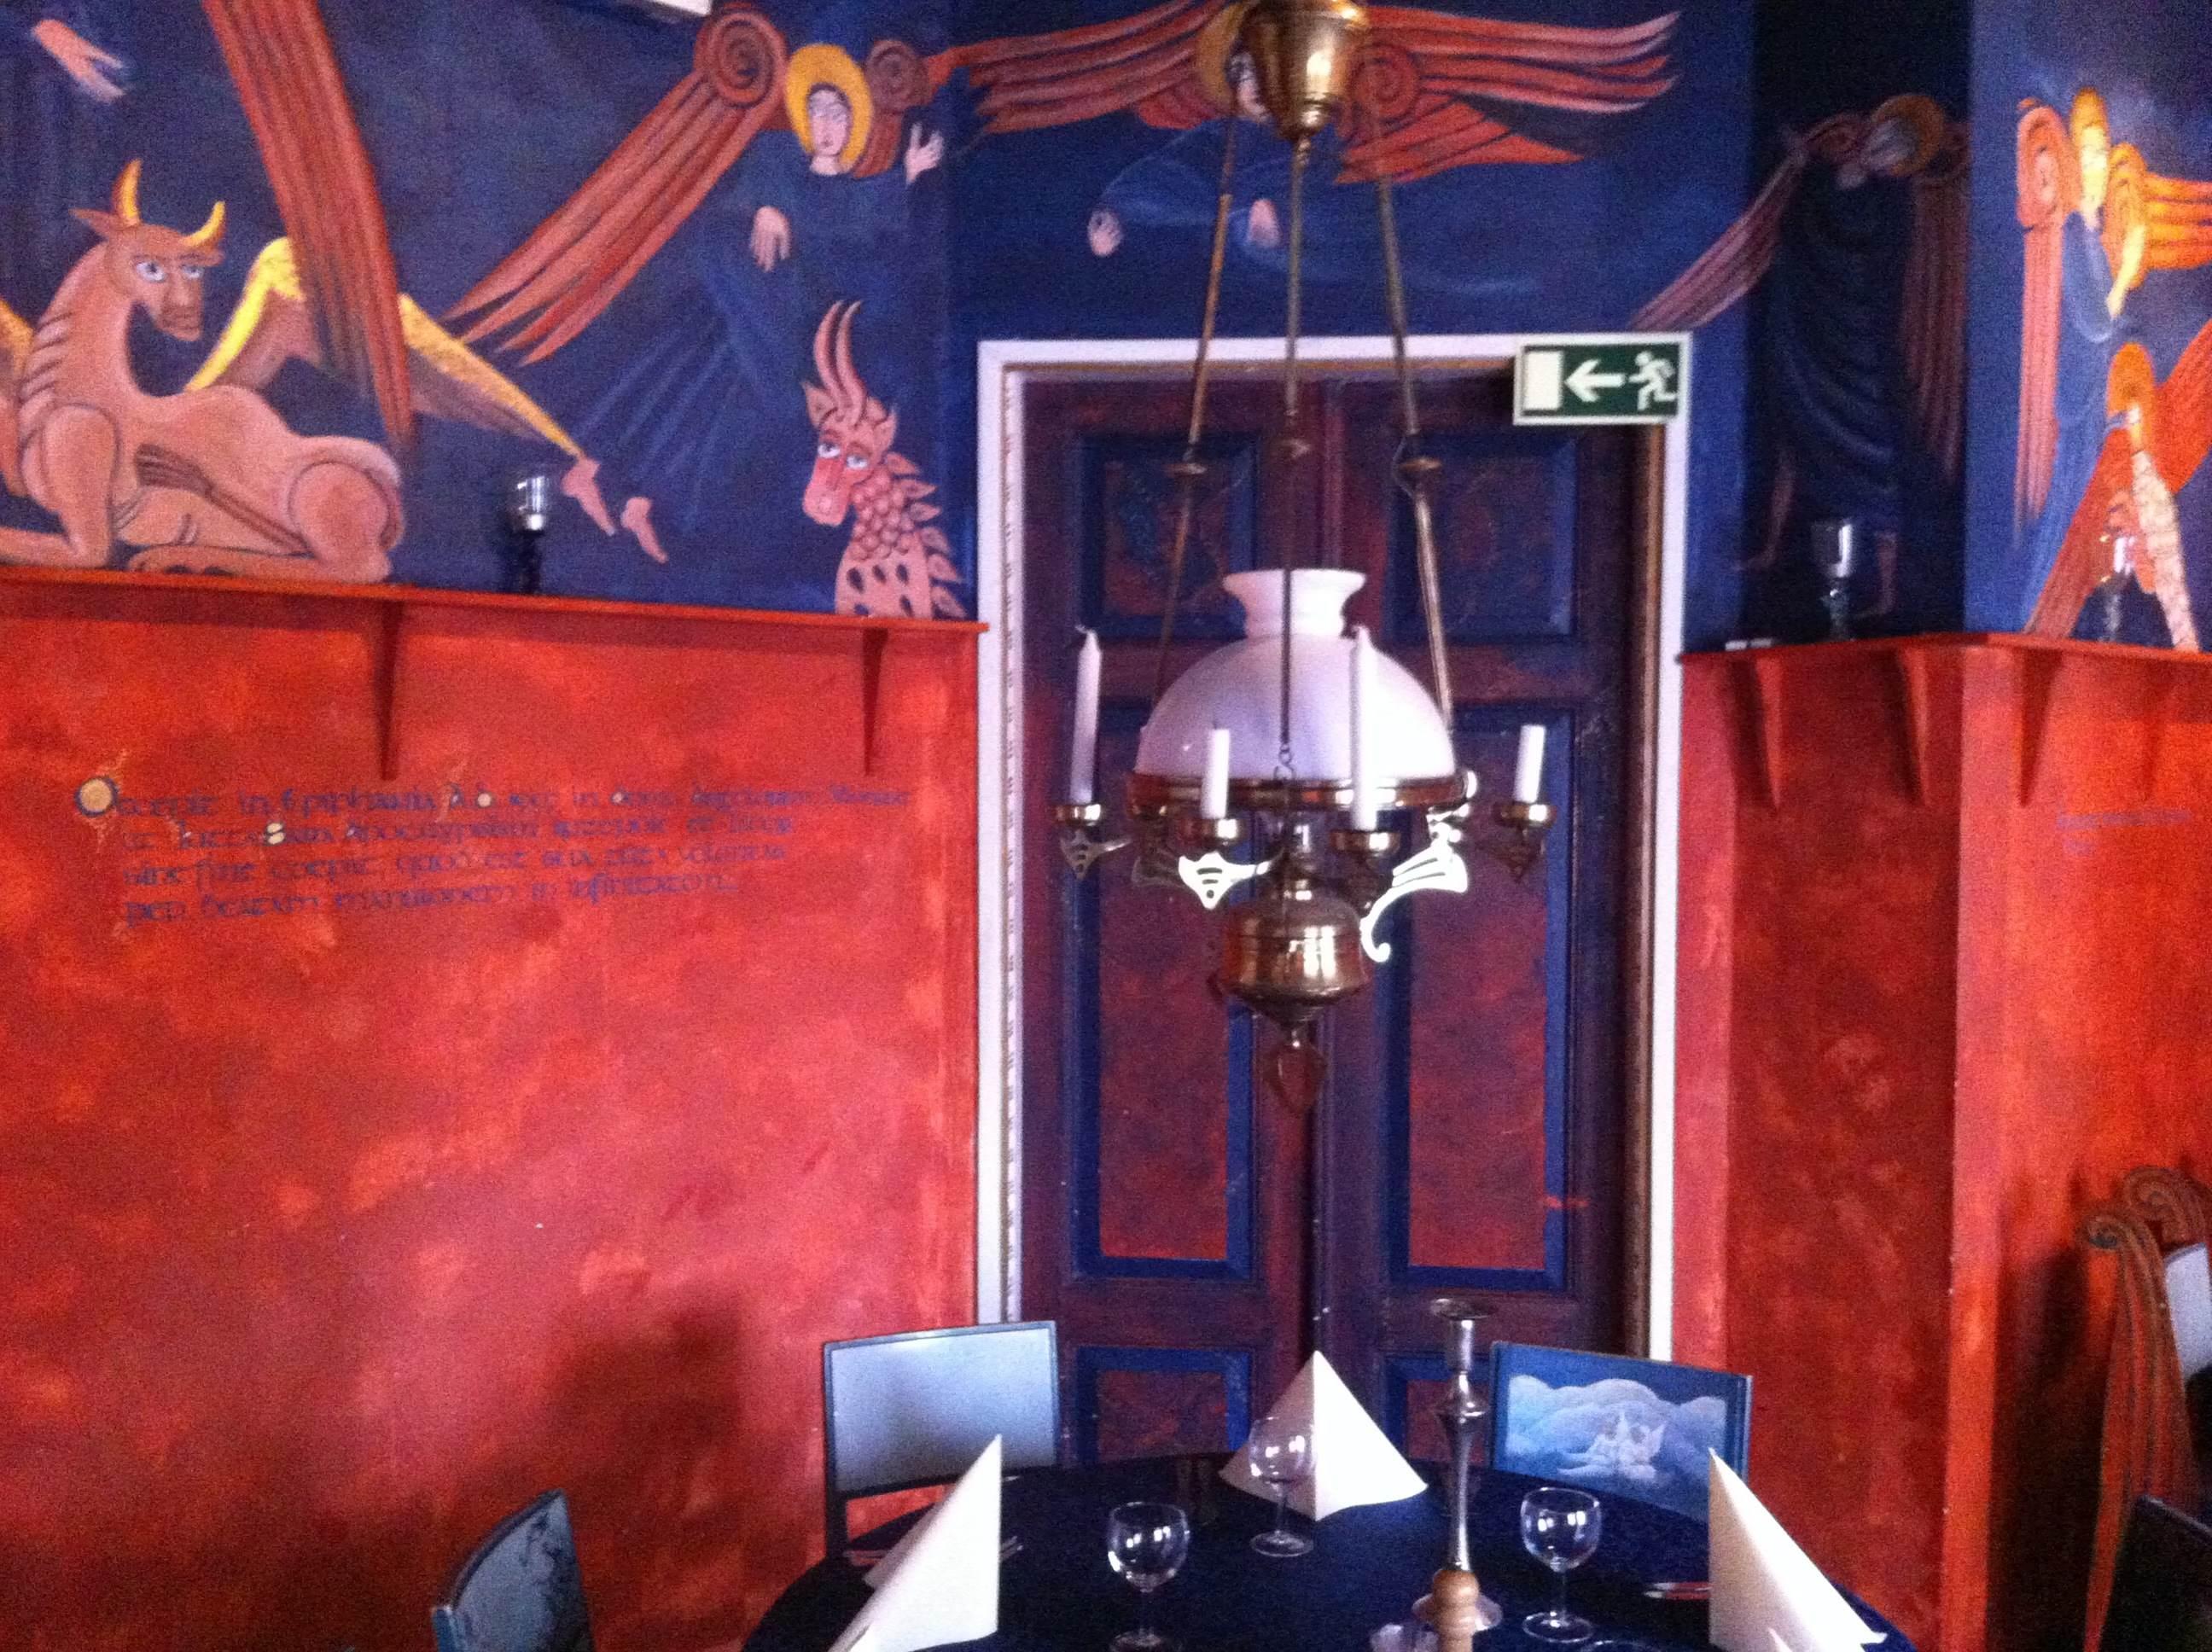 Enkeliravintola, Turku